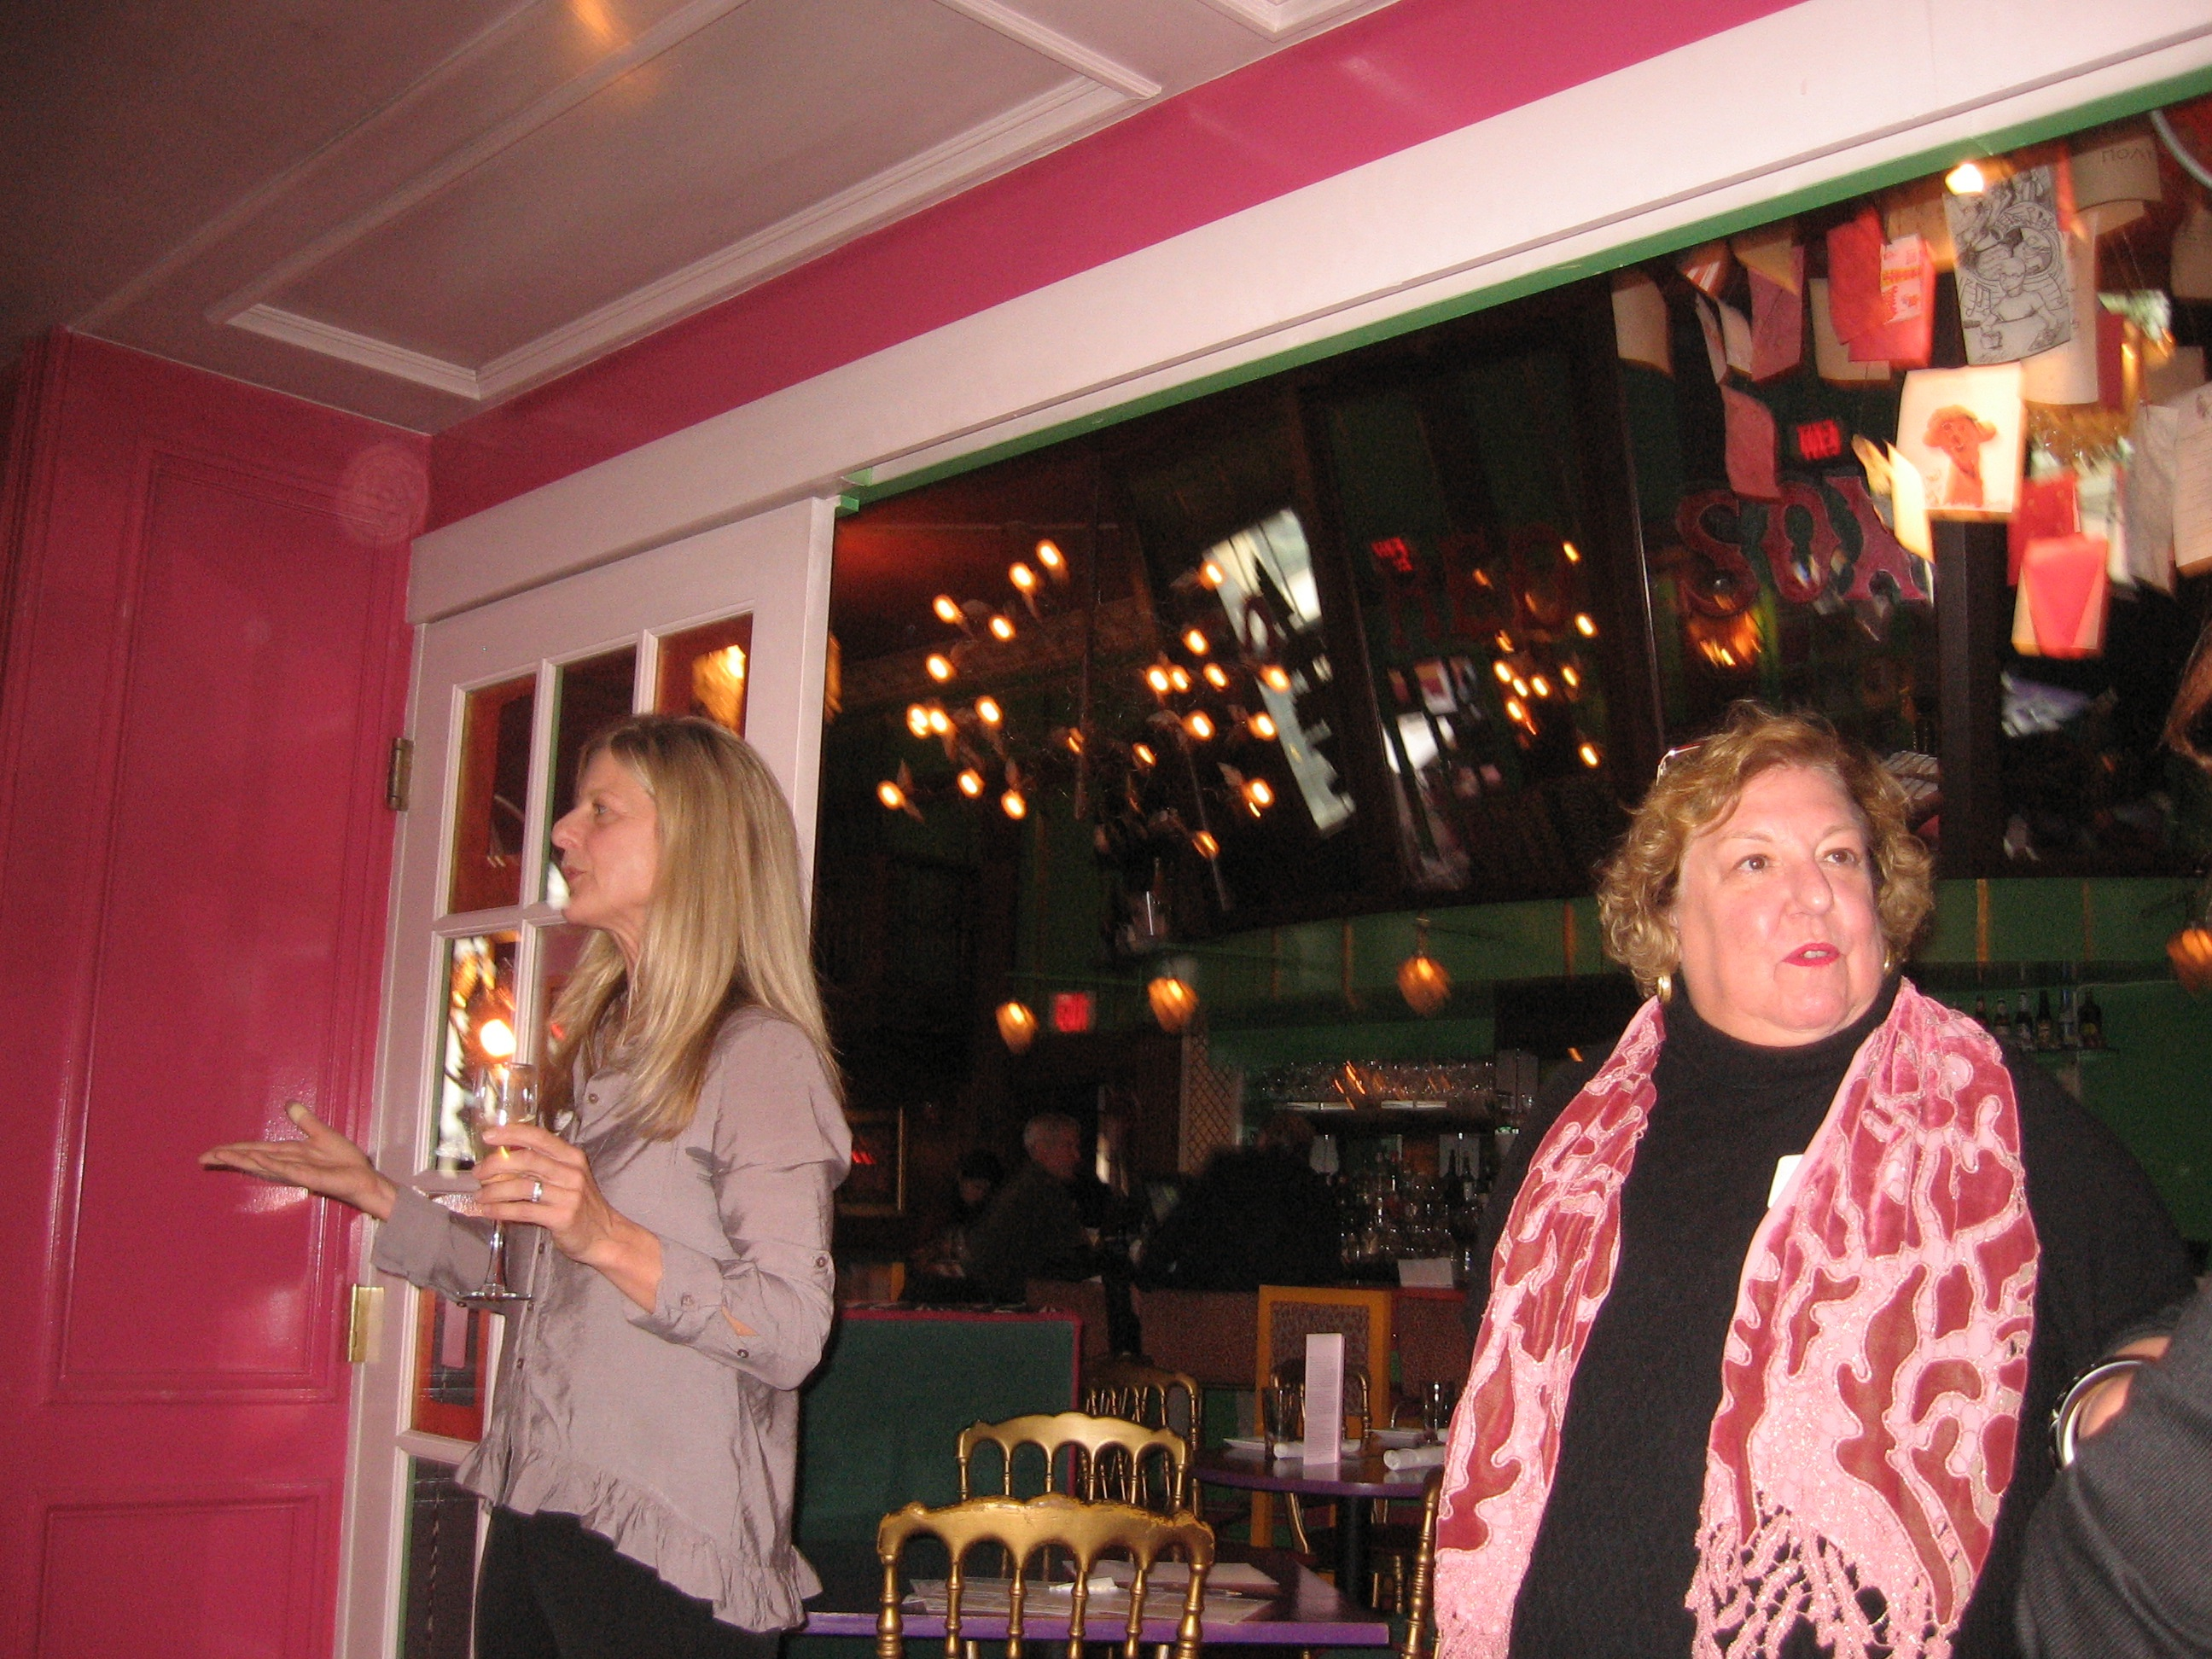 11-2011-Elaine-Totten-Davis-and-Mary-Catherine-Deibel.jpg